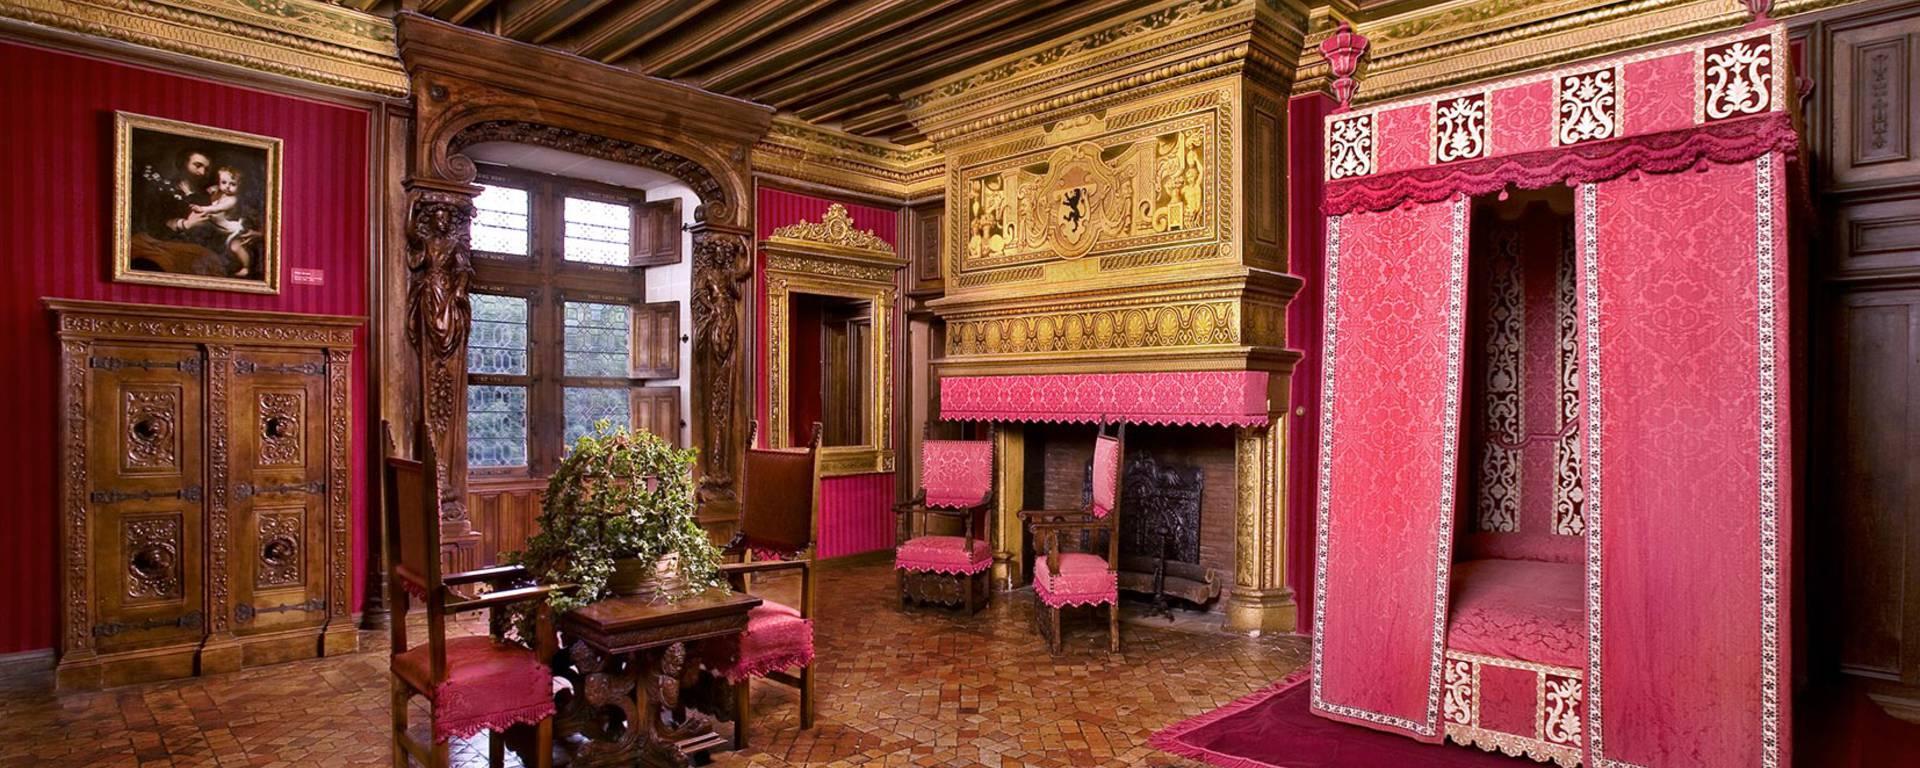 Estancia del Castillo de Chenonceau